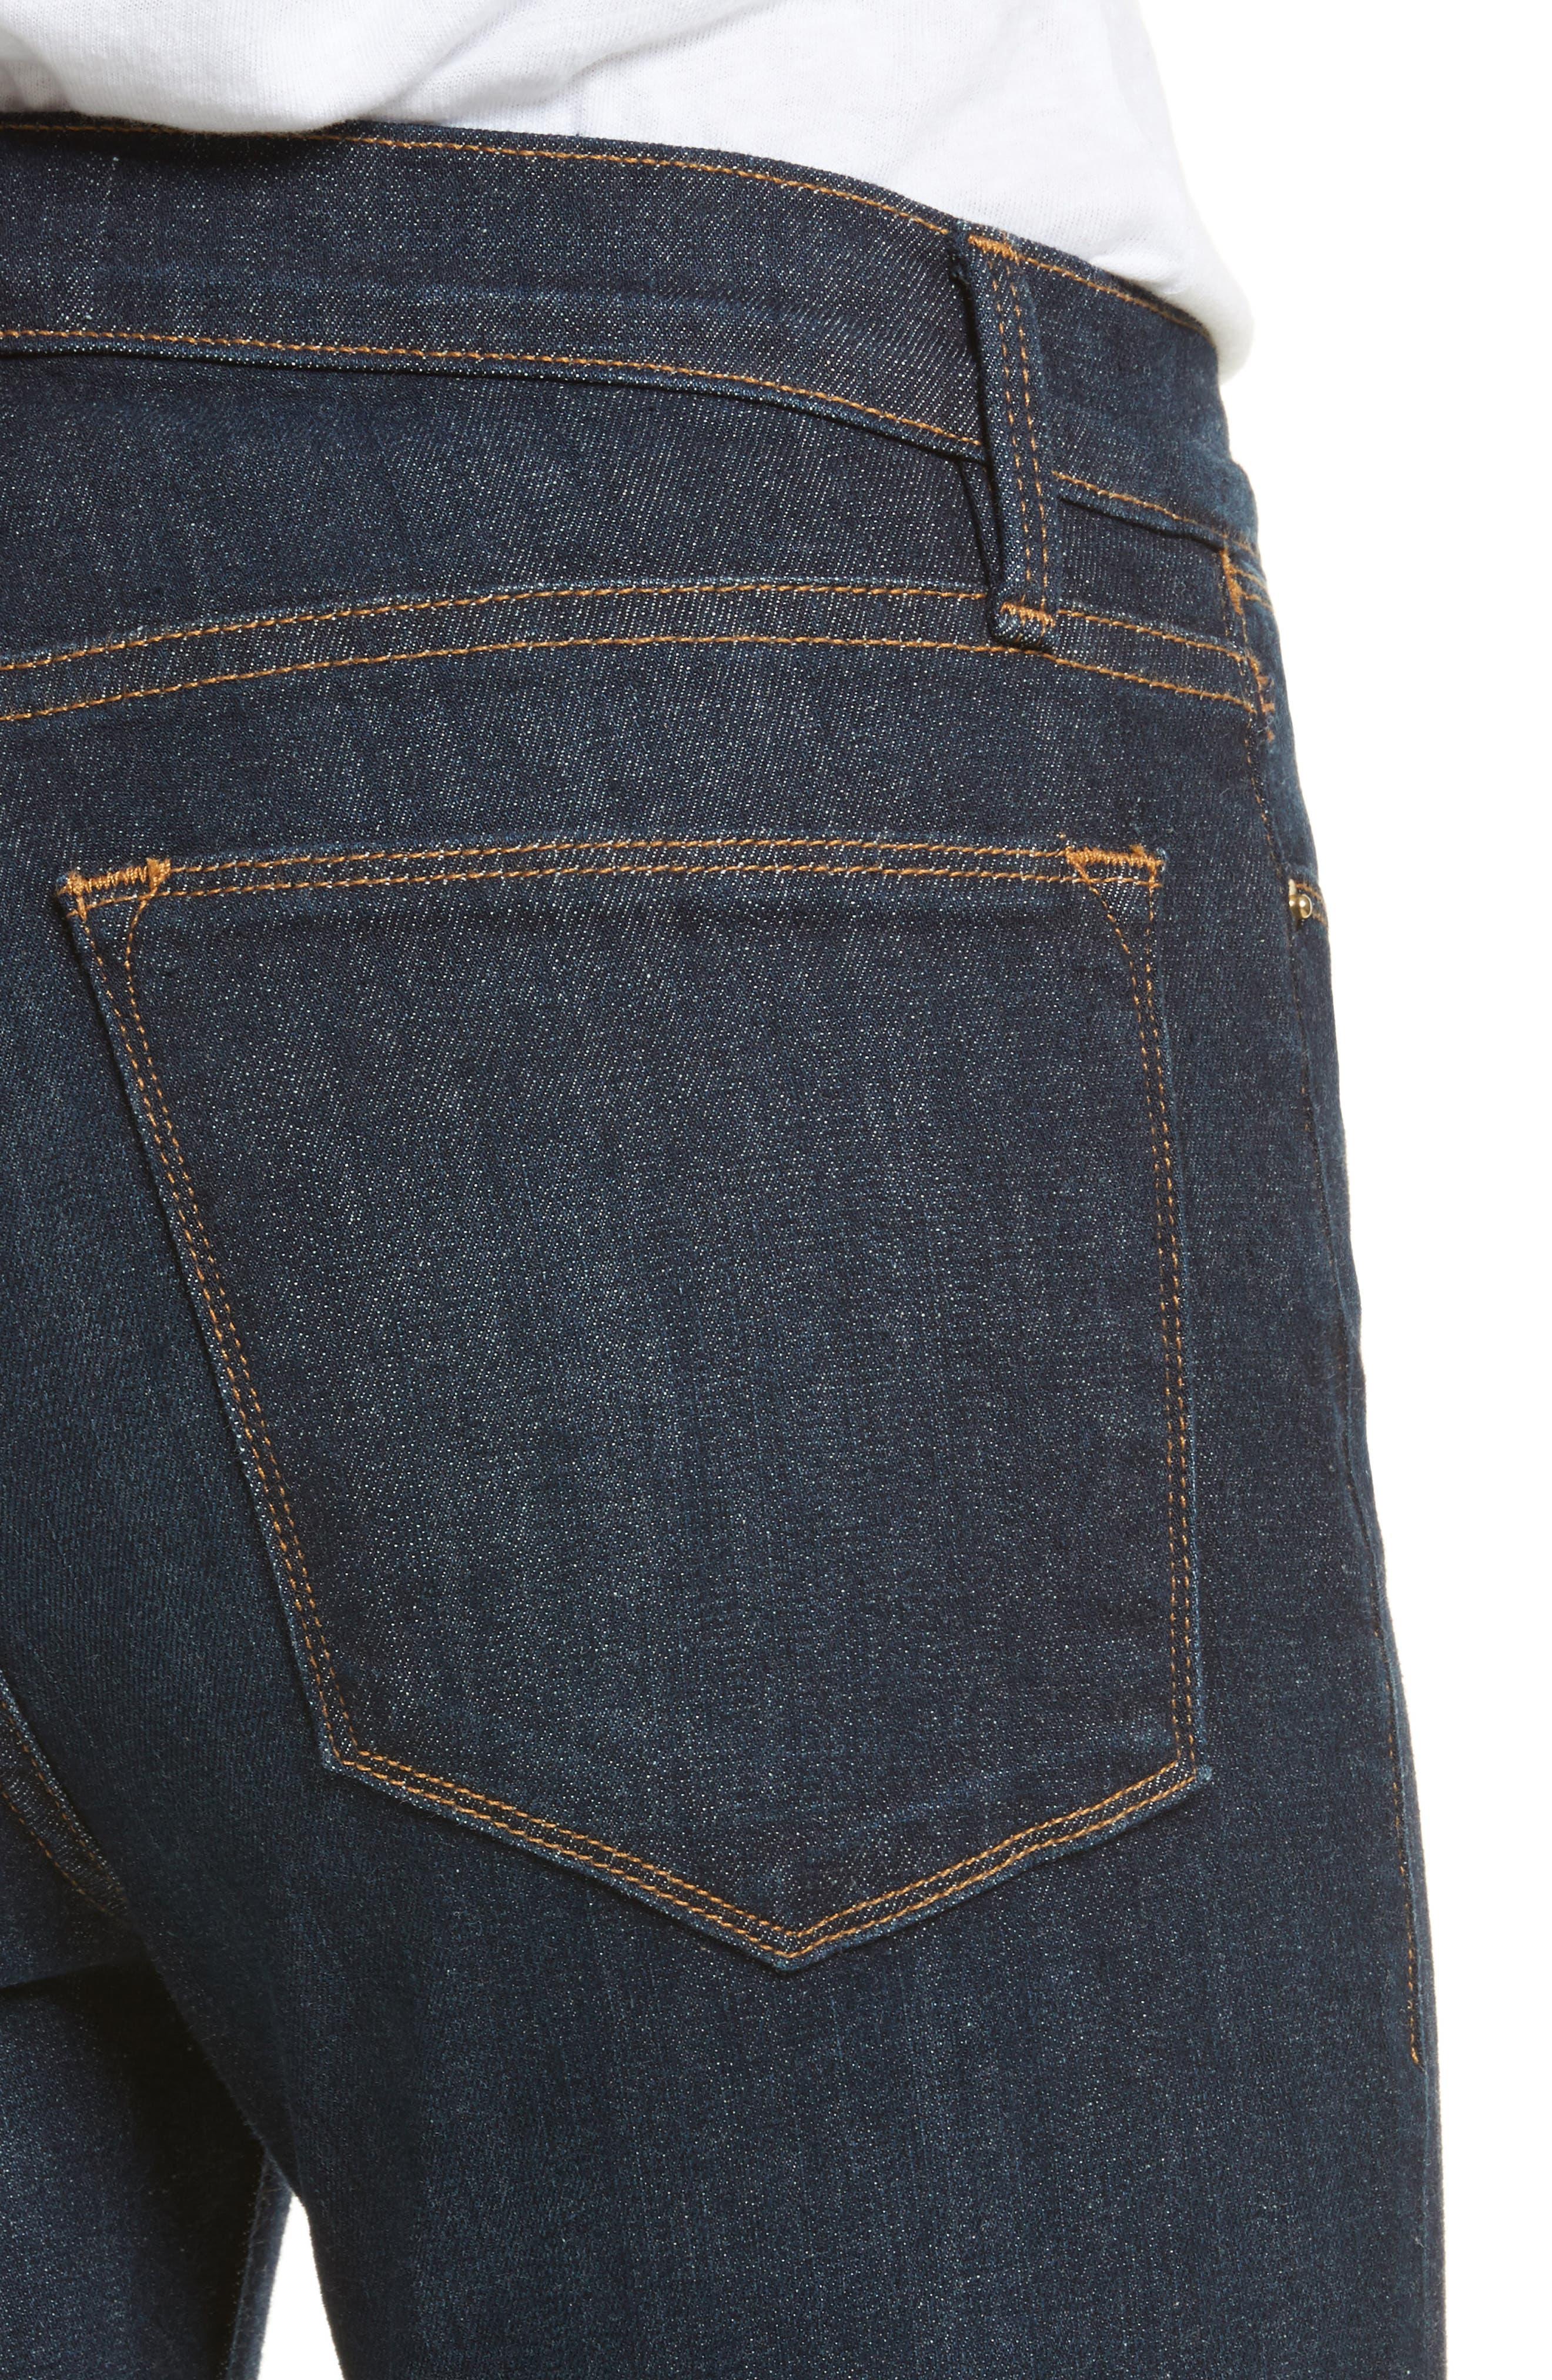 'Le High Flare' Jeans,                             Alternate thumbnail 4, color,                             401